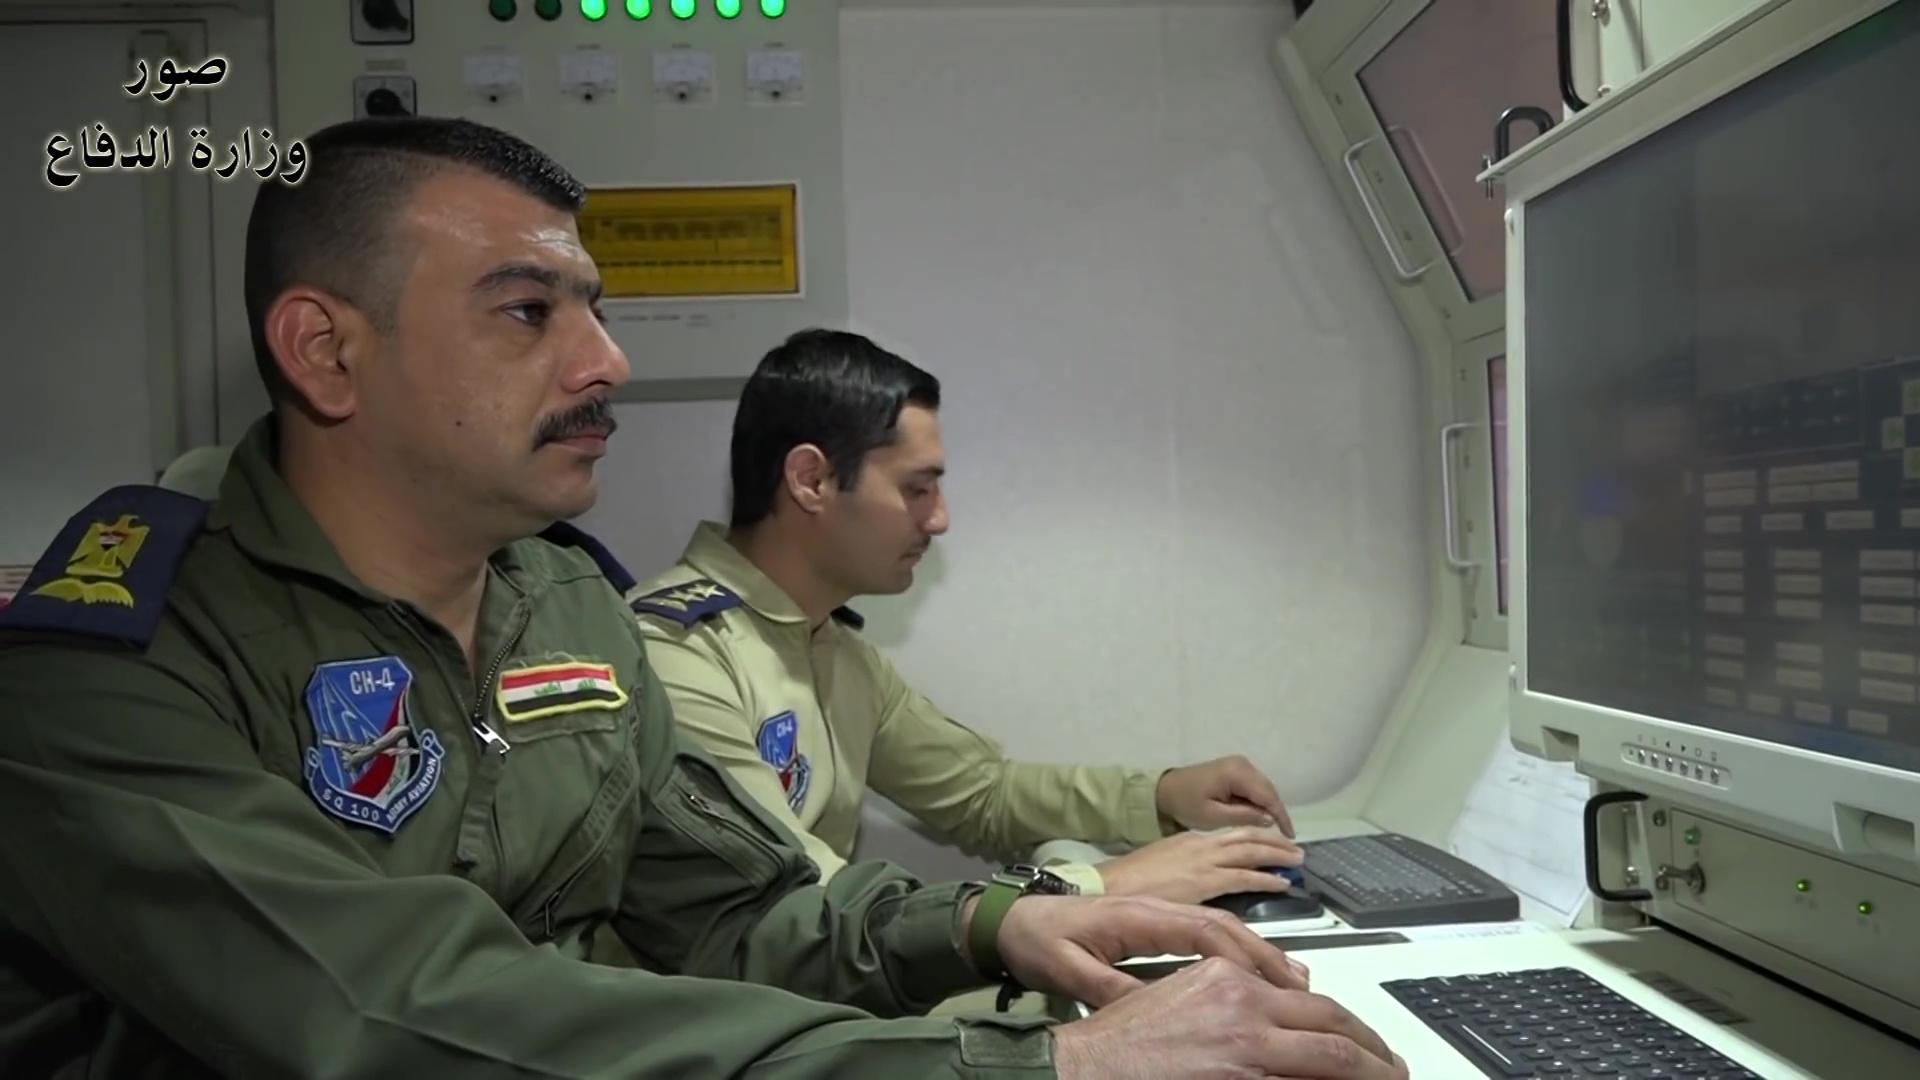 مسابقة رمضان الطائرات دون طيار  2018-02-18-Les-officiers-irakiens-parlent-du-drone-CH-4-14